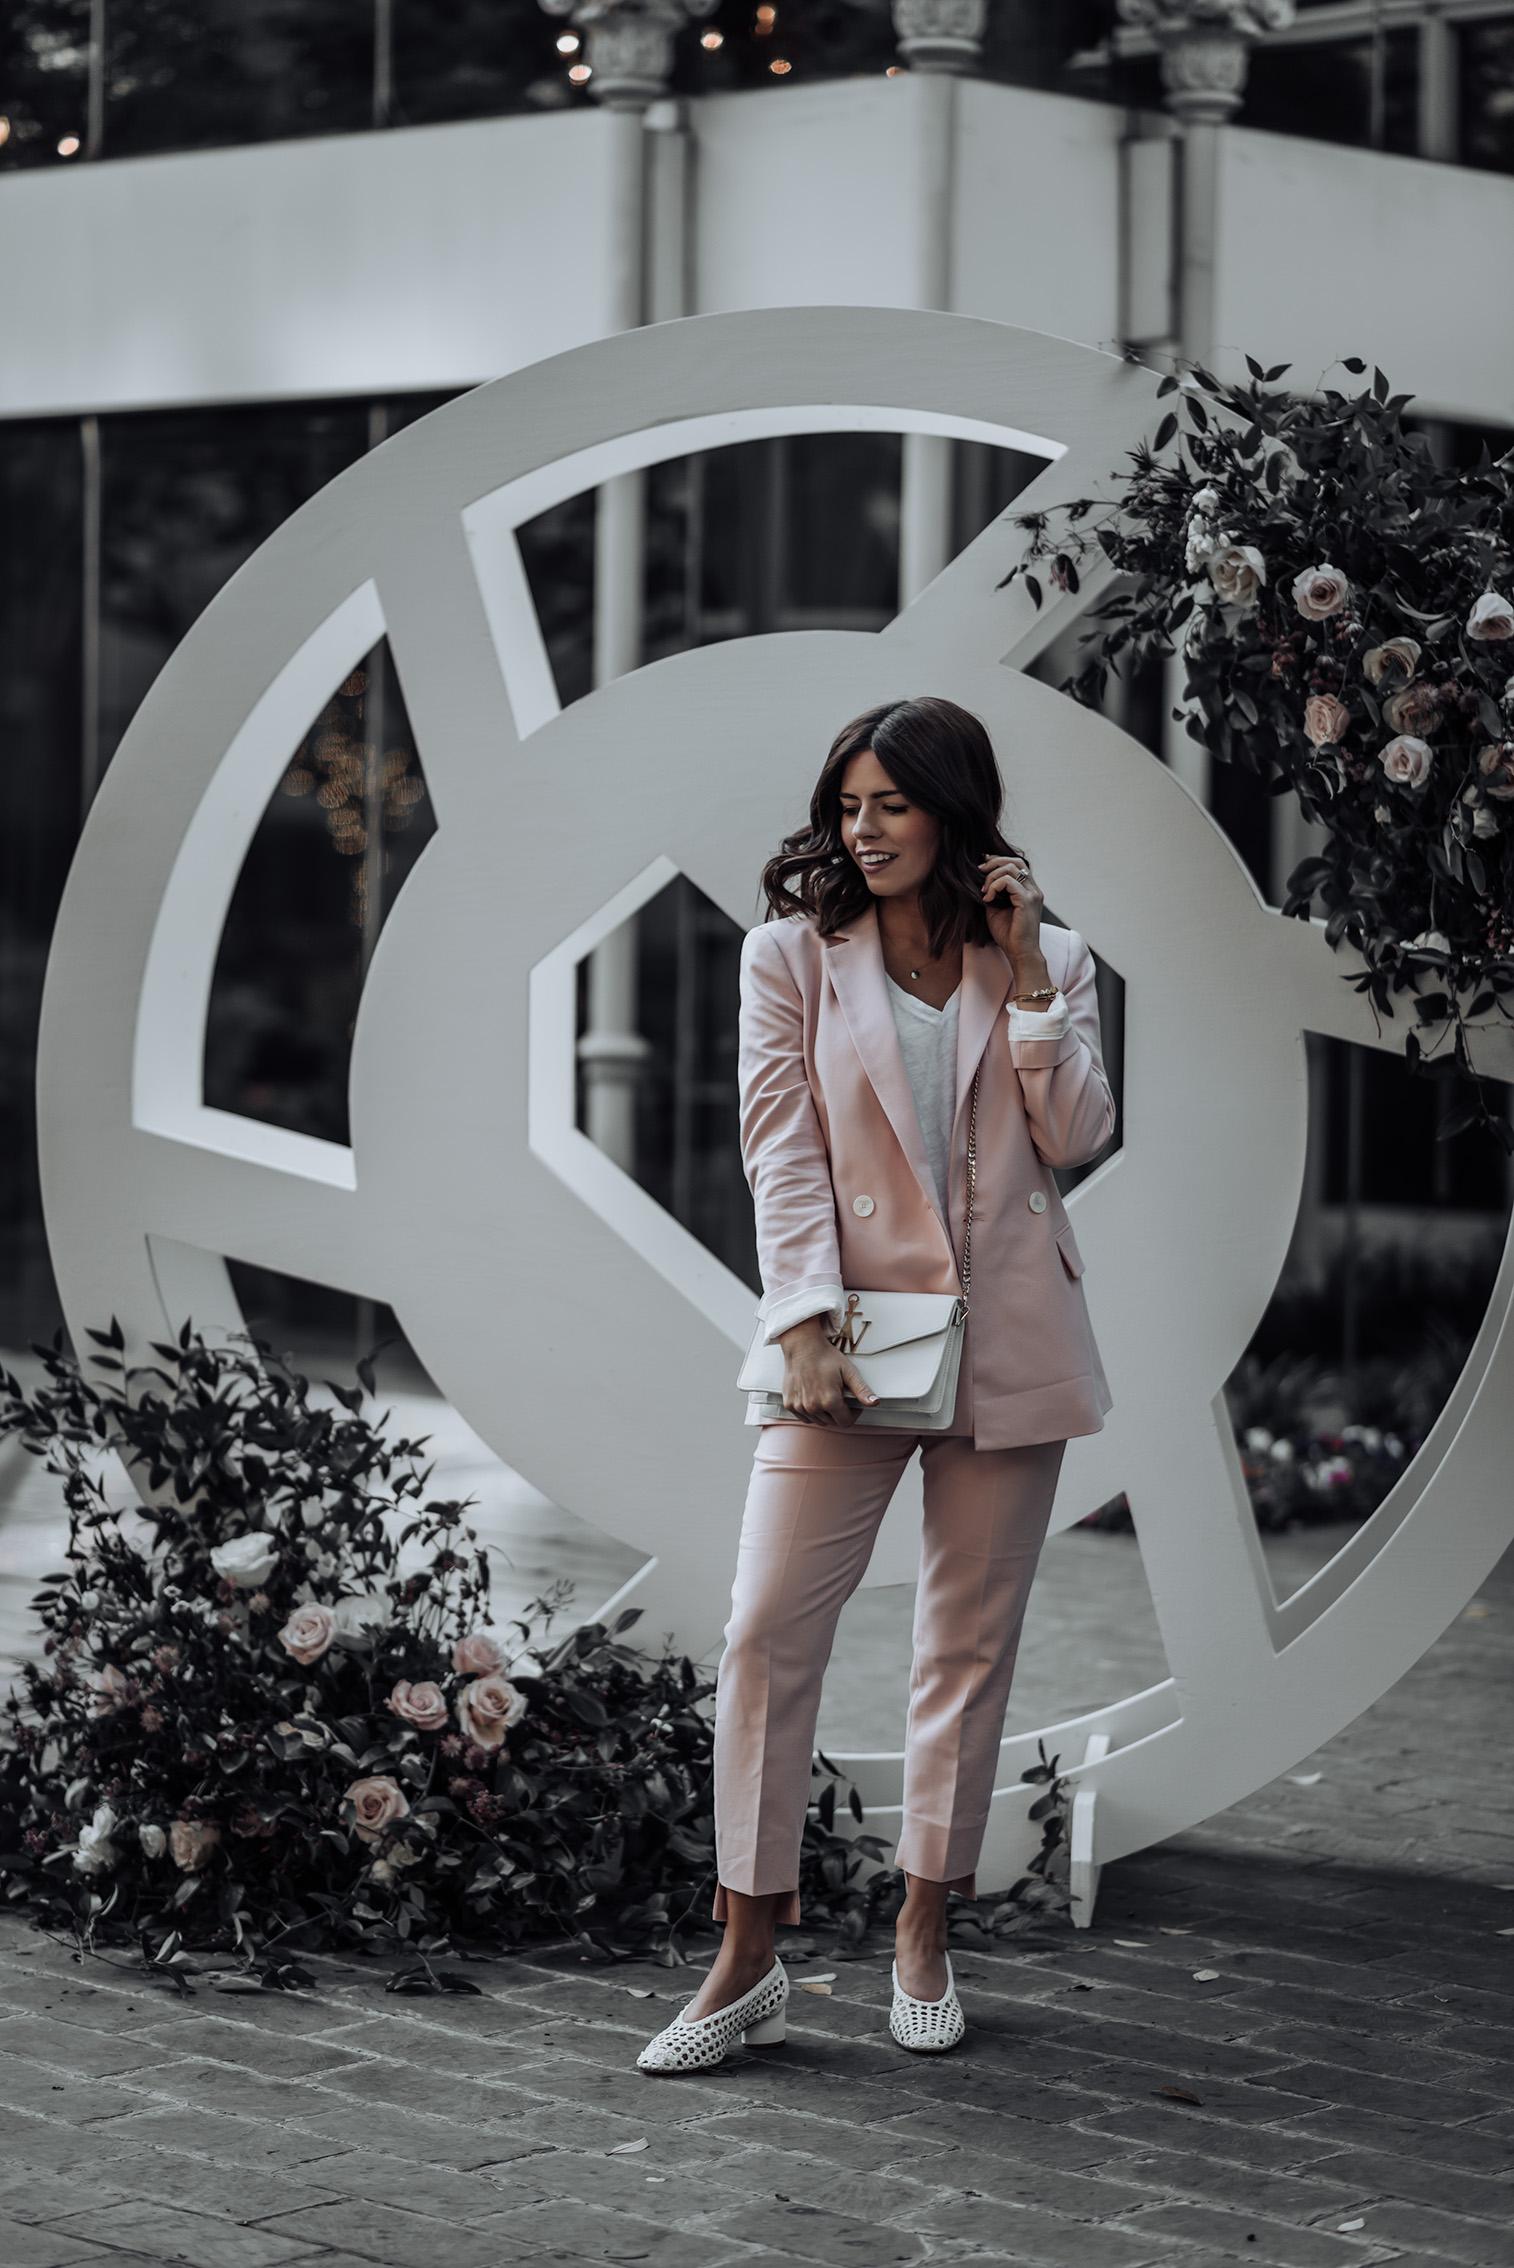 Pant suit |Blush pant suit Zara (similar Blazer & Pant) | J.W. Anderson Bag | Ray-bans | Superga Platforms | #liketkit #pantsuit #zara #streetstyle #blogger